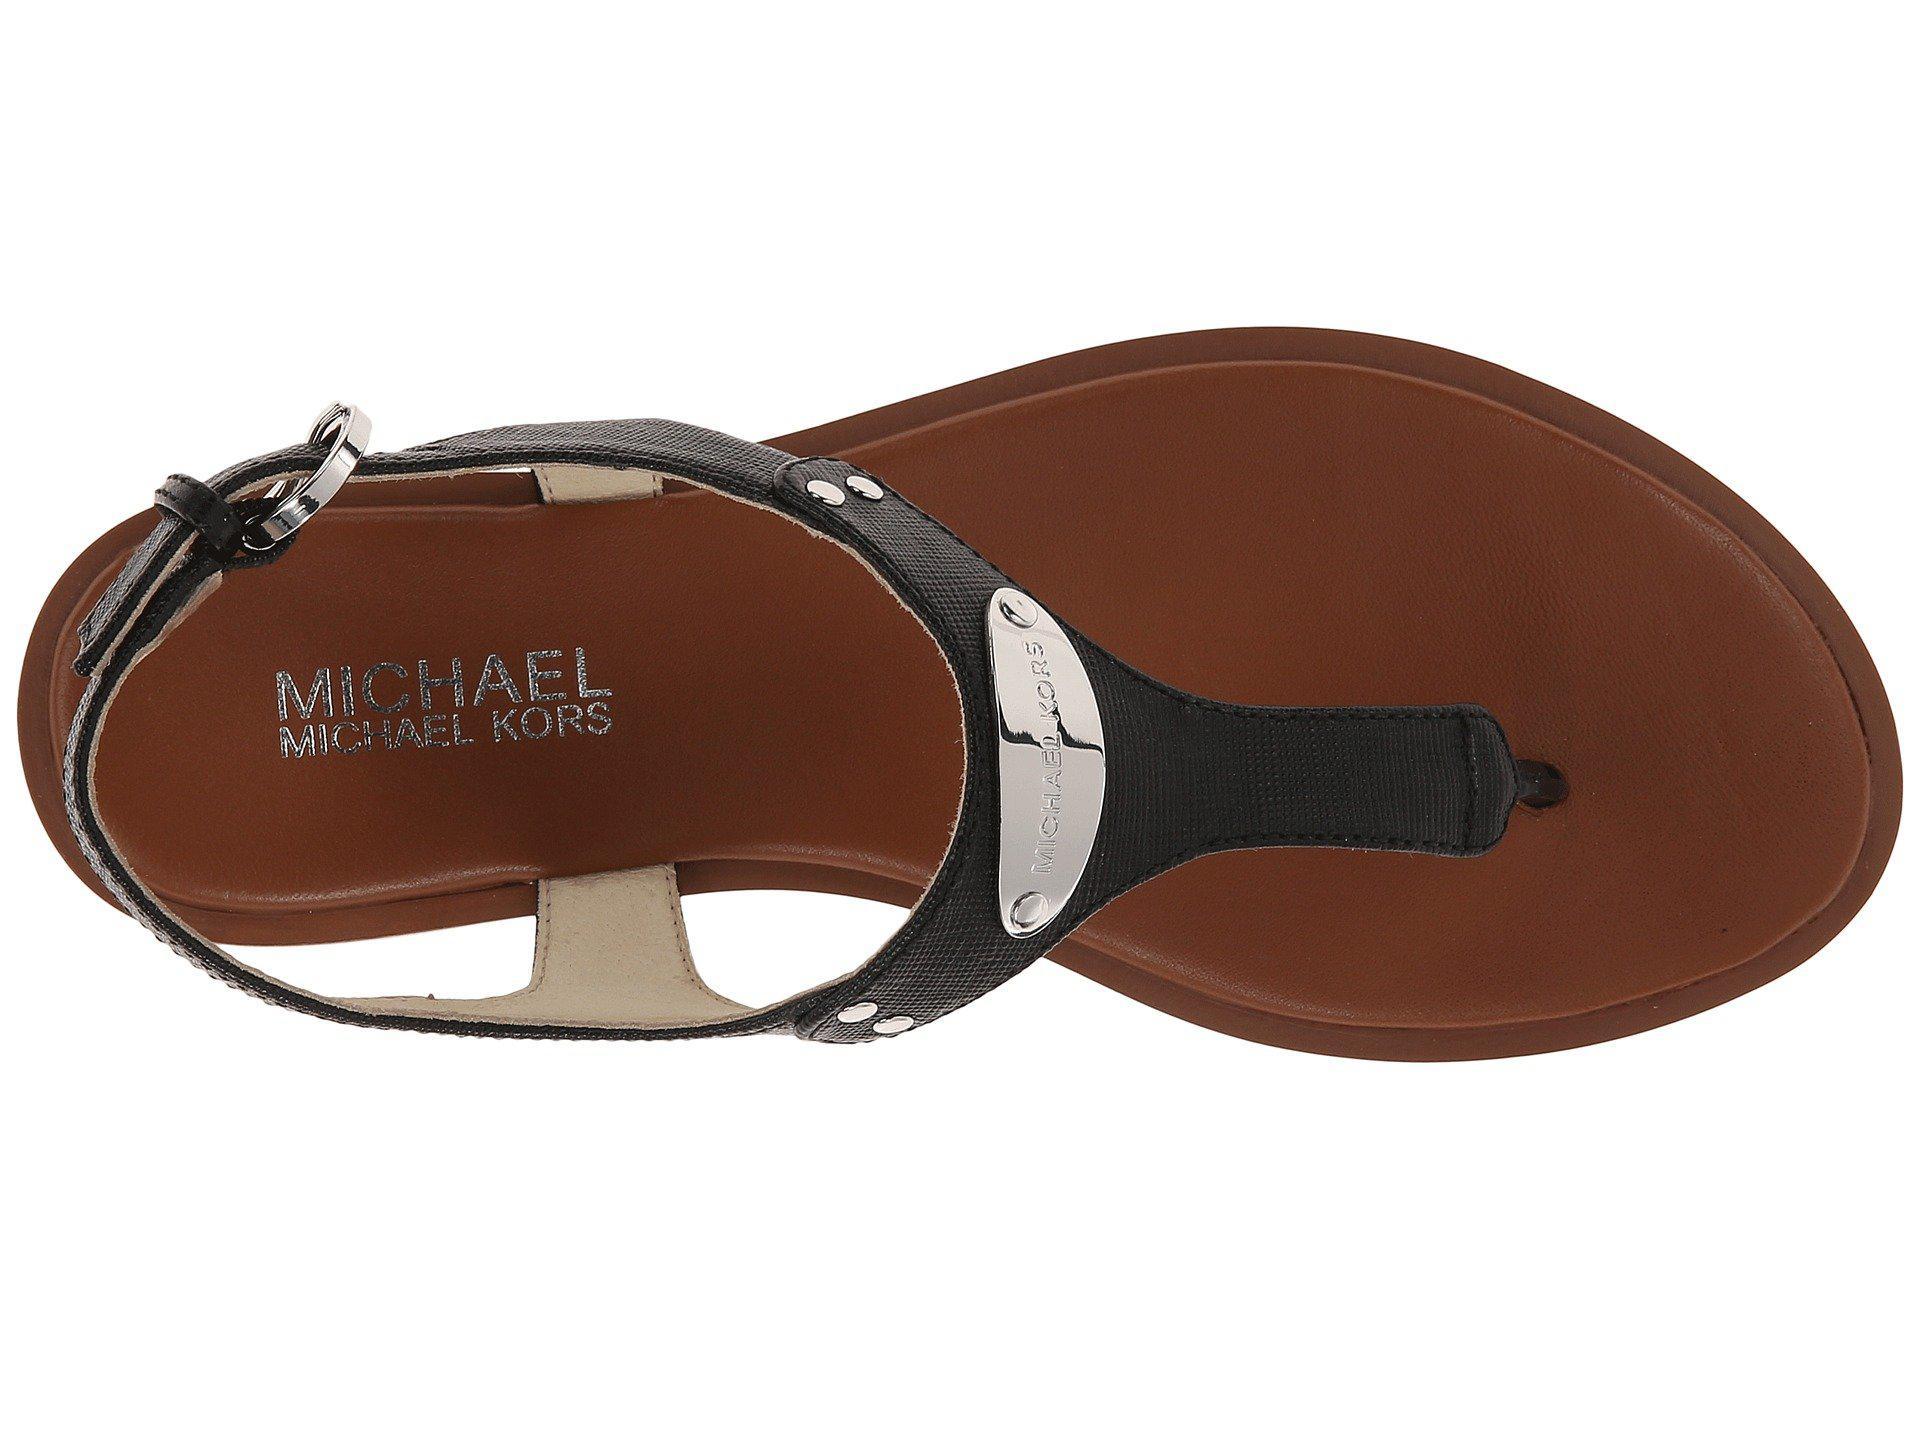 448c81bb7f2b MICHAEL Michael Kors - Black Mk Plate Thong (Luggage) Women s Sandals -  Lyst. View fullscreen